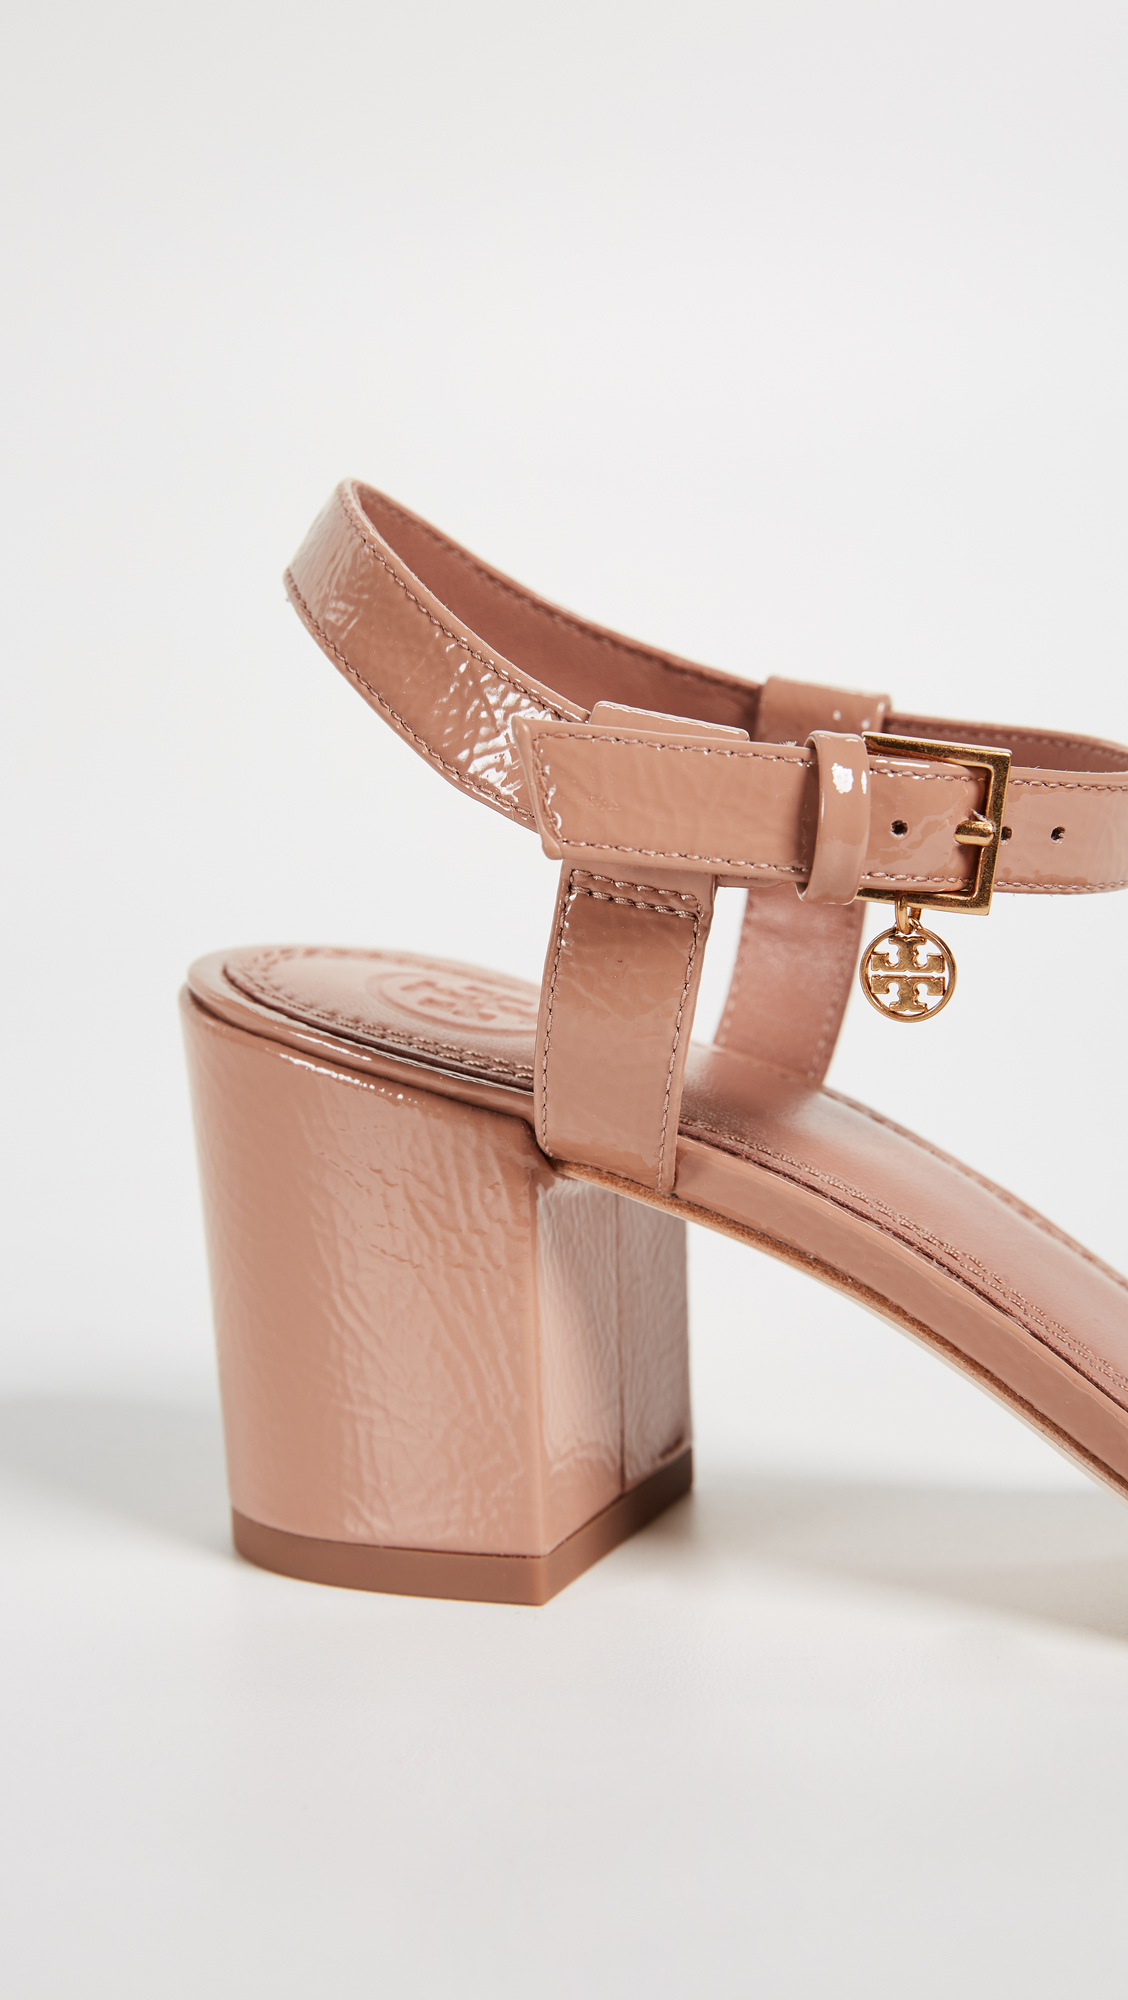 4f121d26576adf Tory Burch Laurel 65mm Ankle Strap Sandals